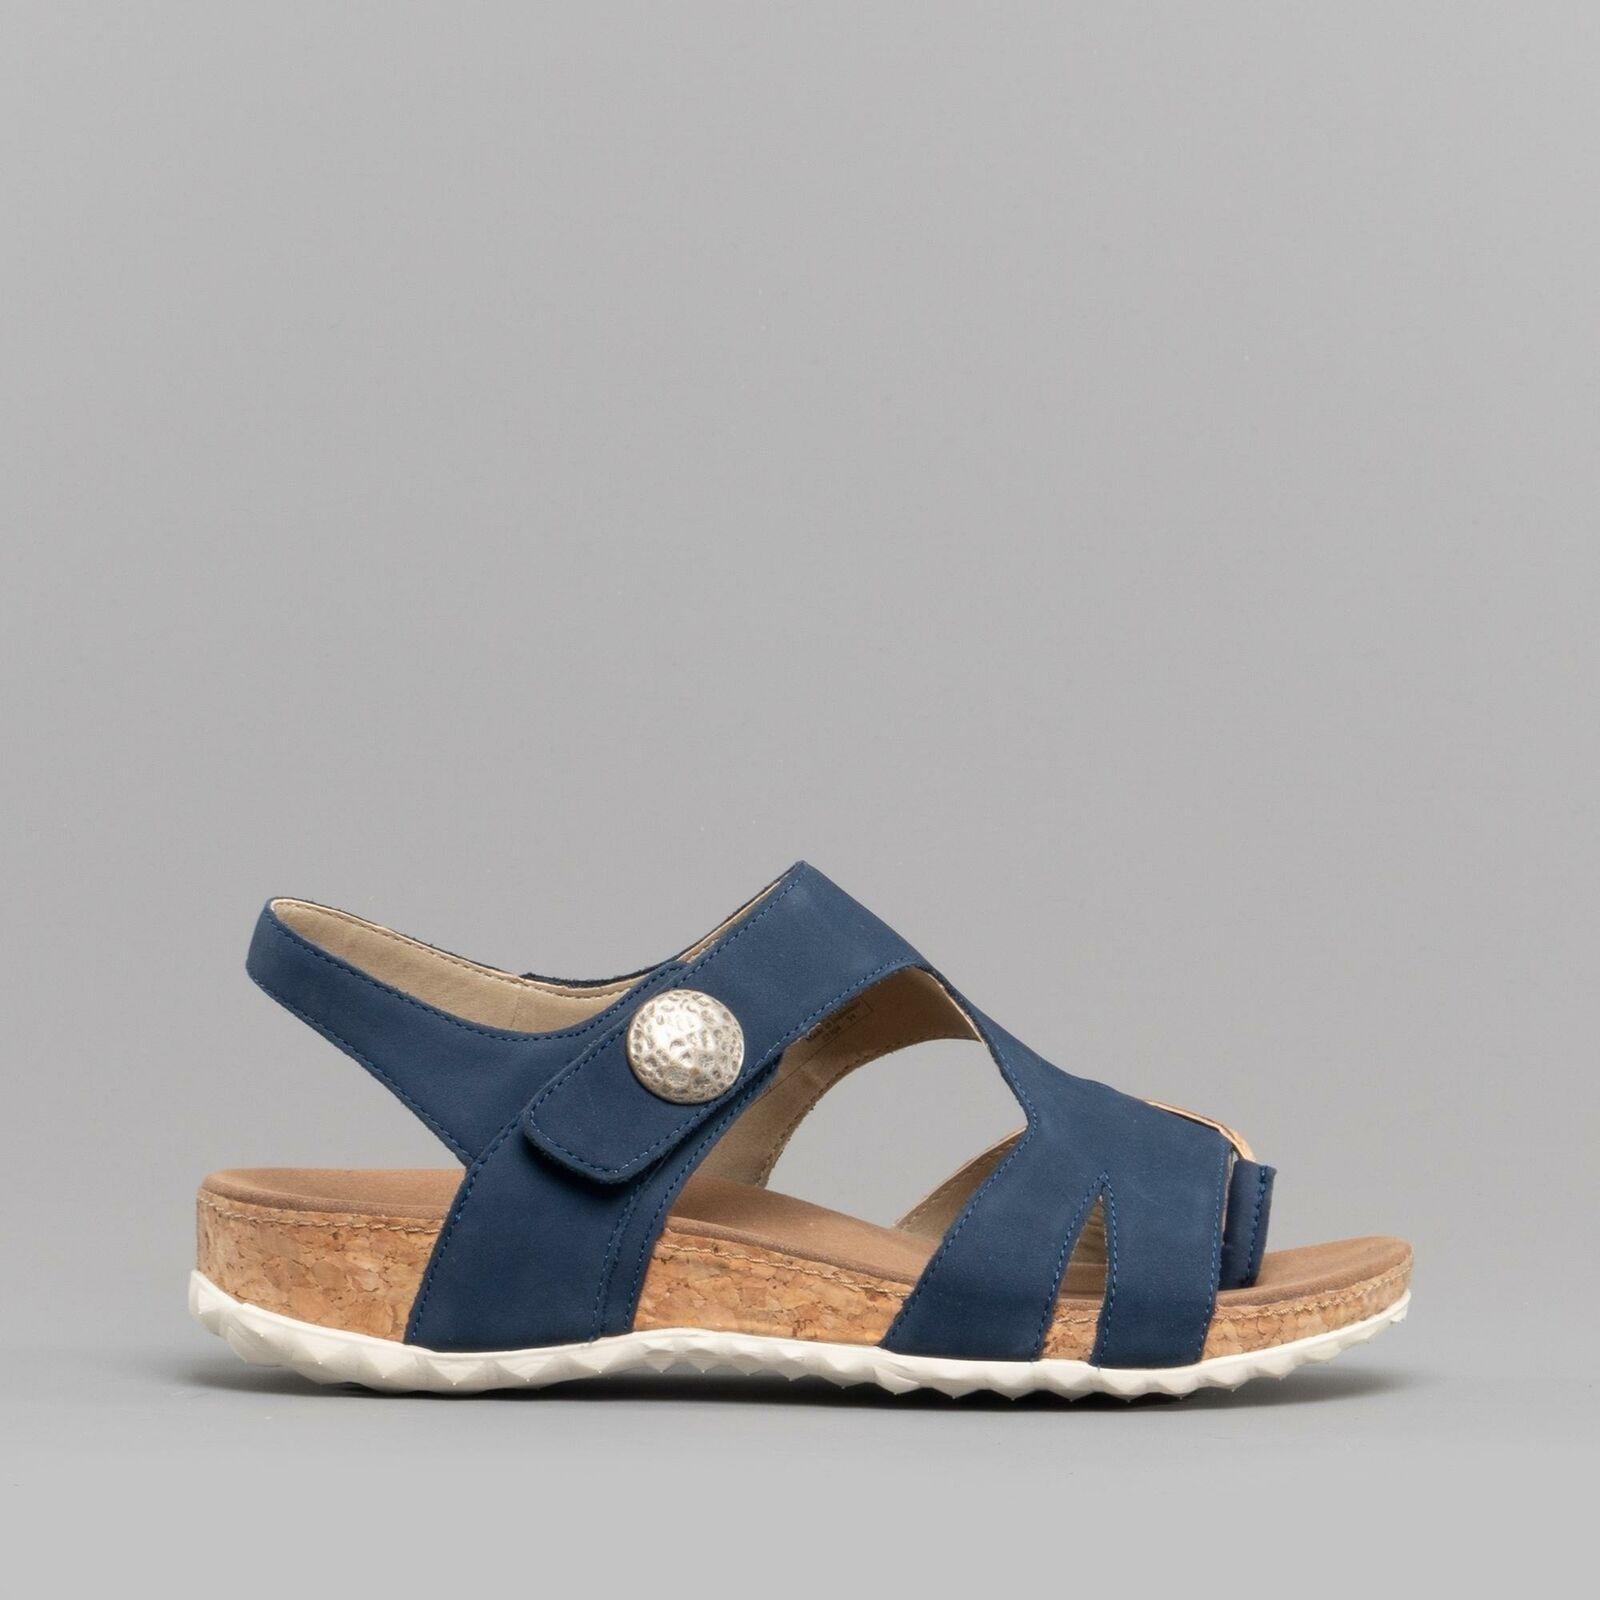 Romika Florenz 04 Stivali in Pelle Tocco Fissare Estate Sandali Misure Ocean Combi blu